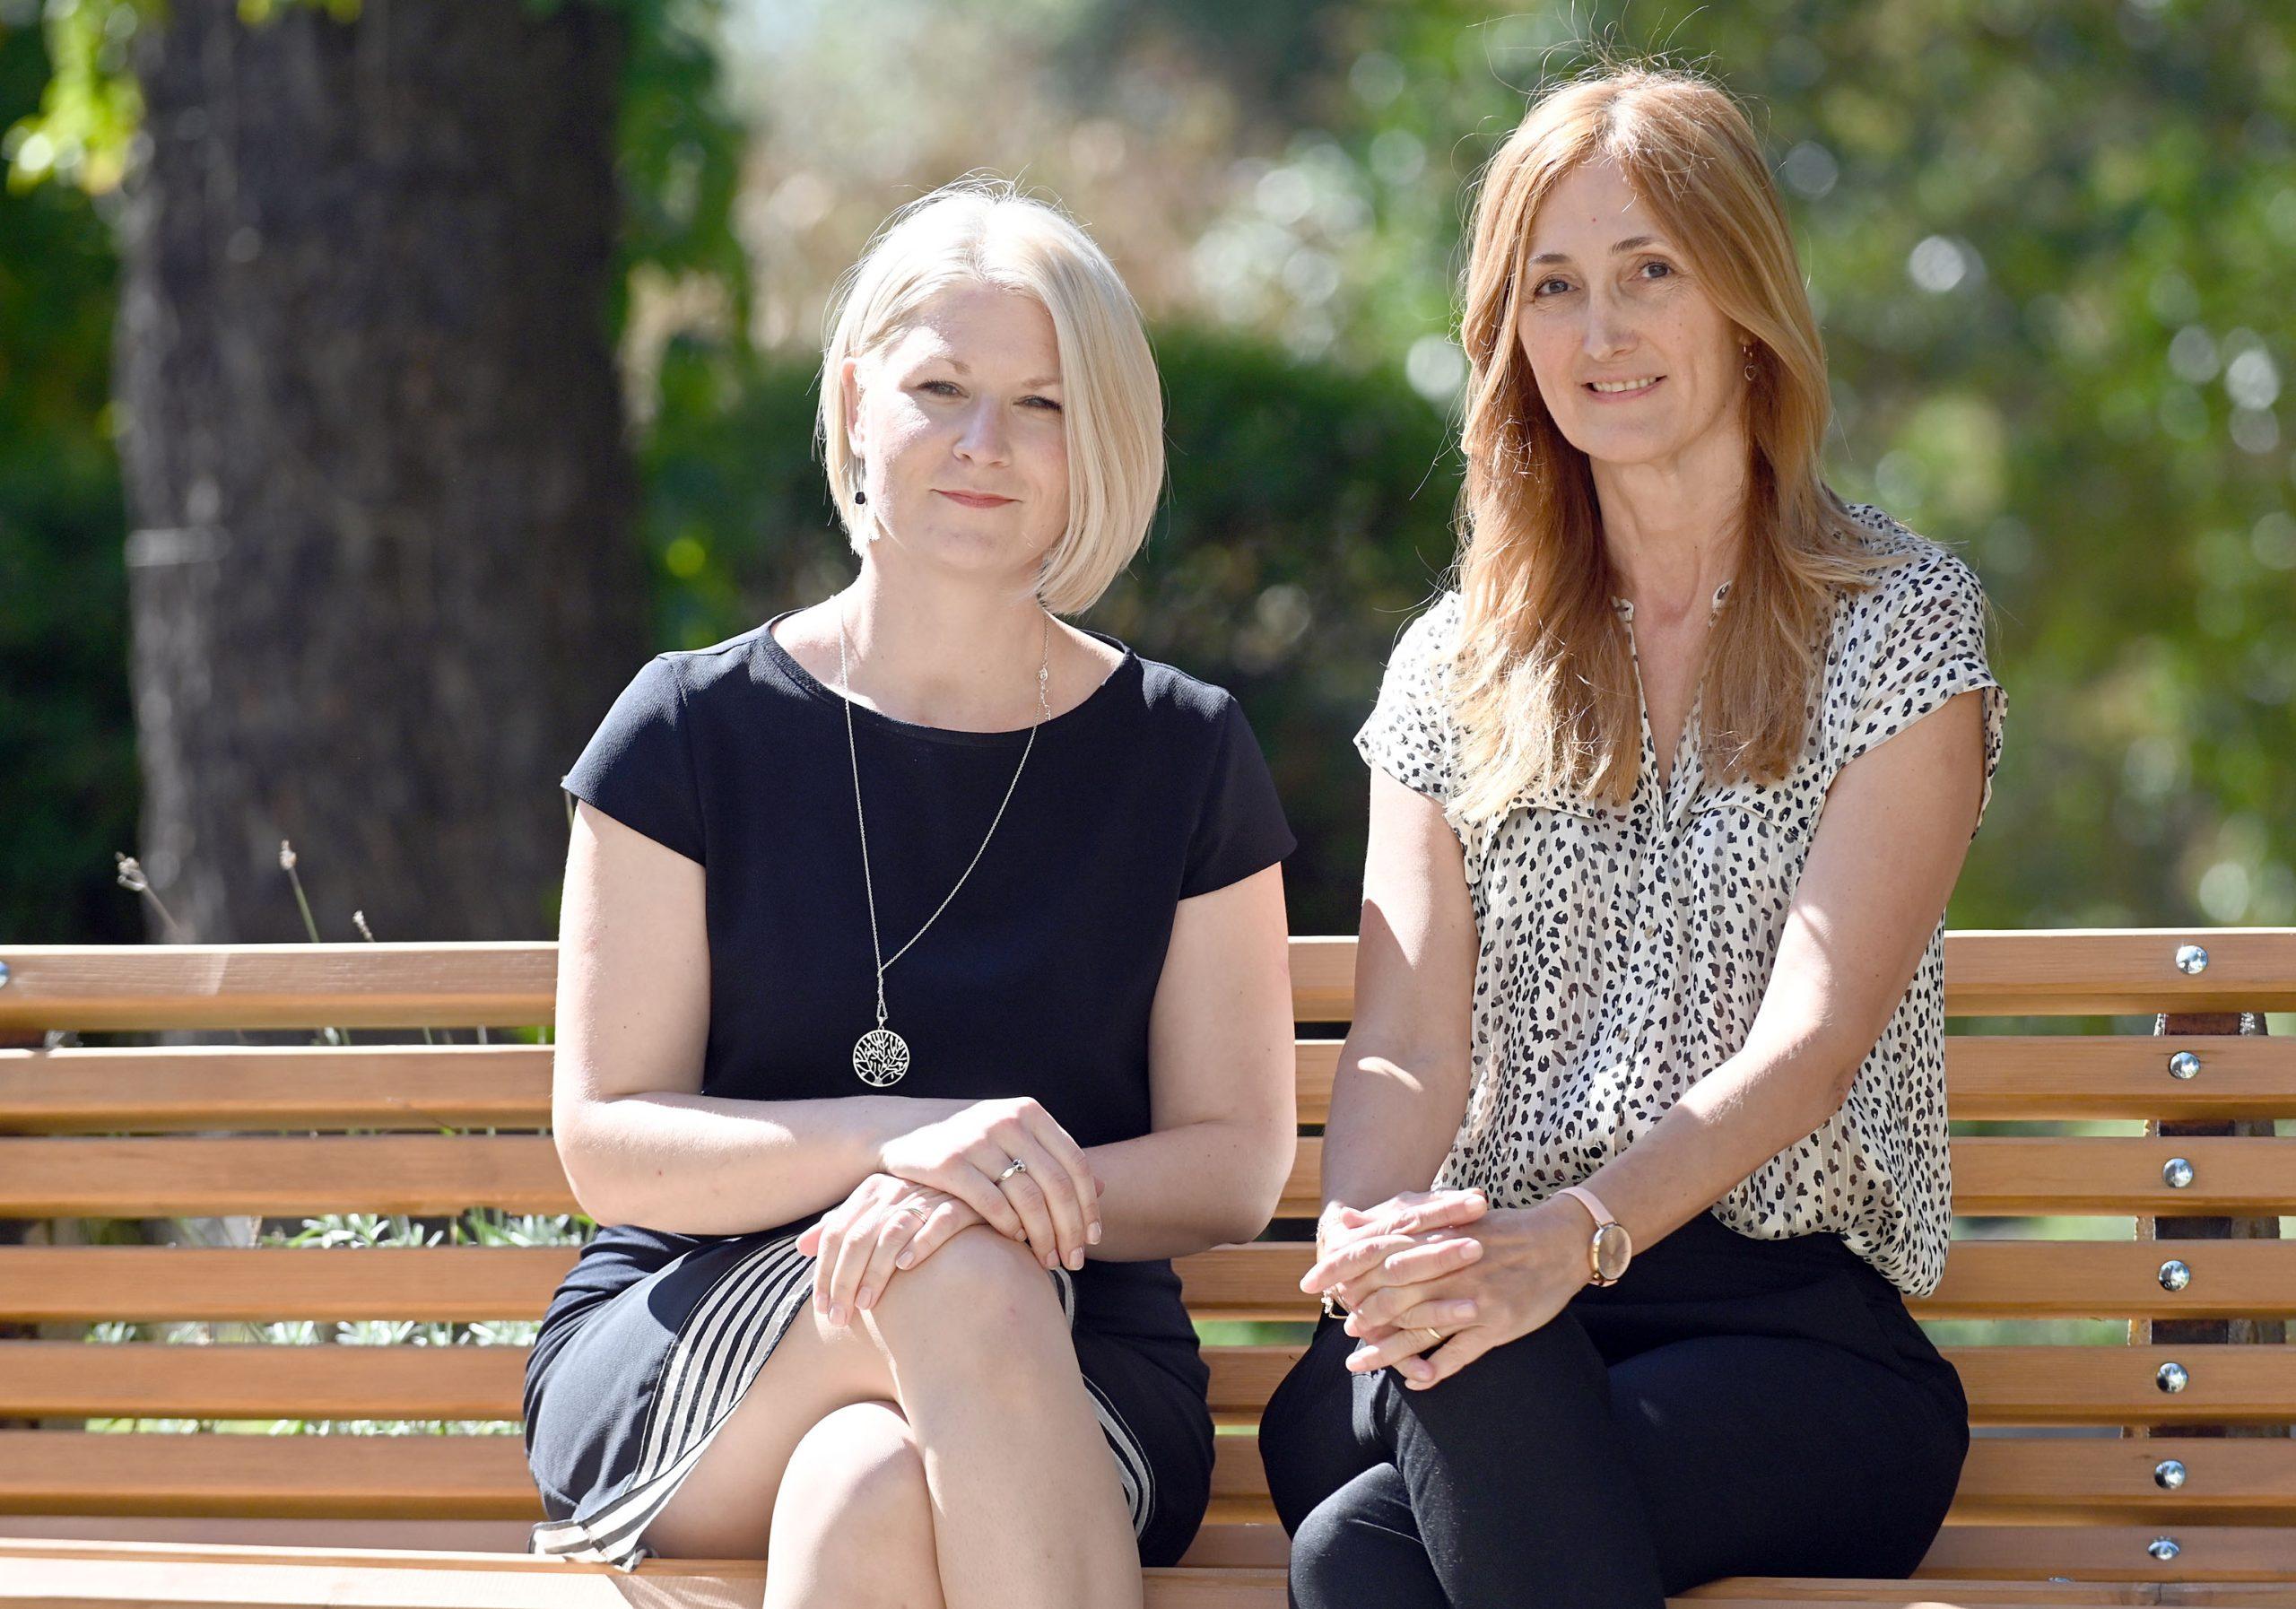 Mirna Petković Didović i Olga Cvijanović Peloza / Foto Vedran Karuza